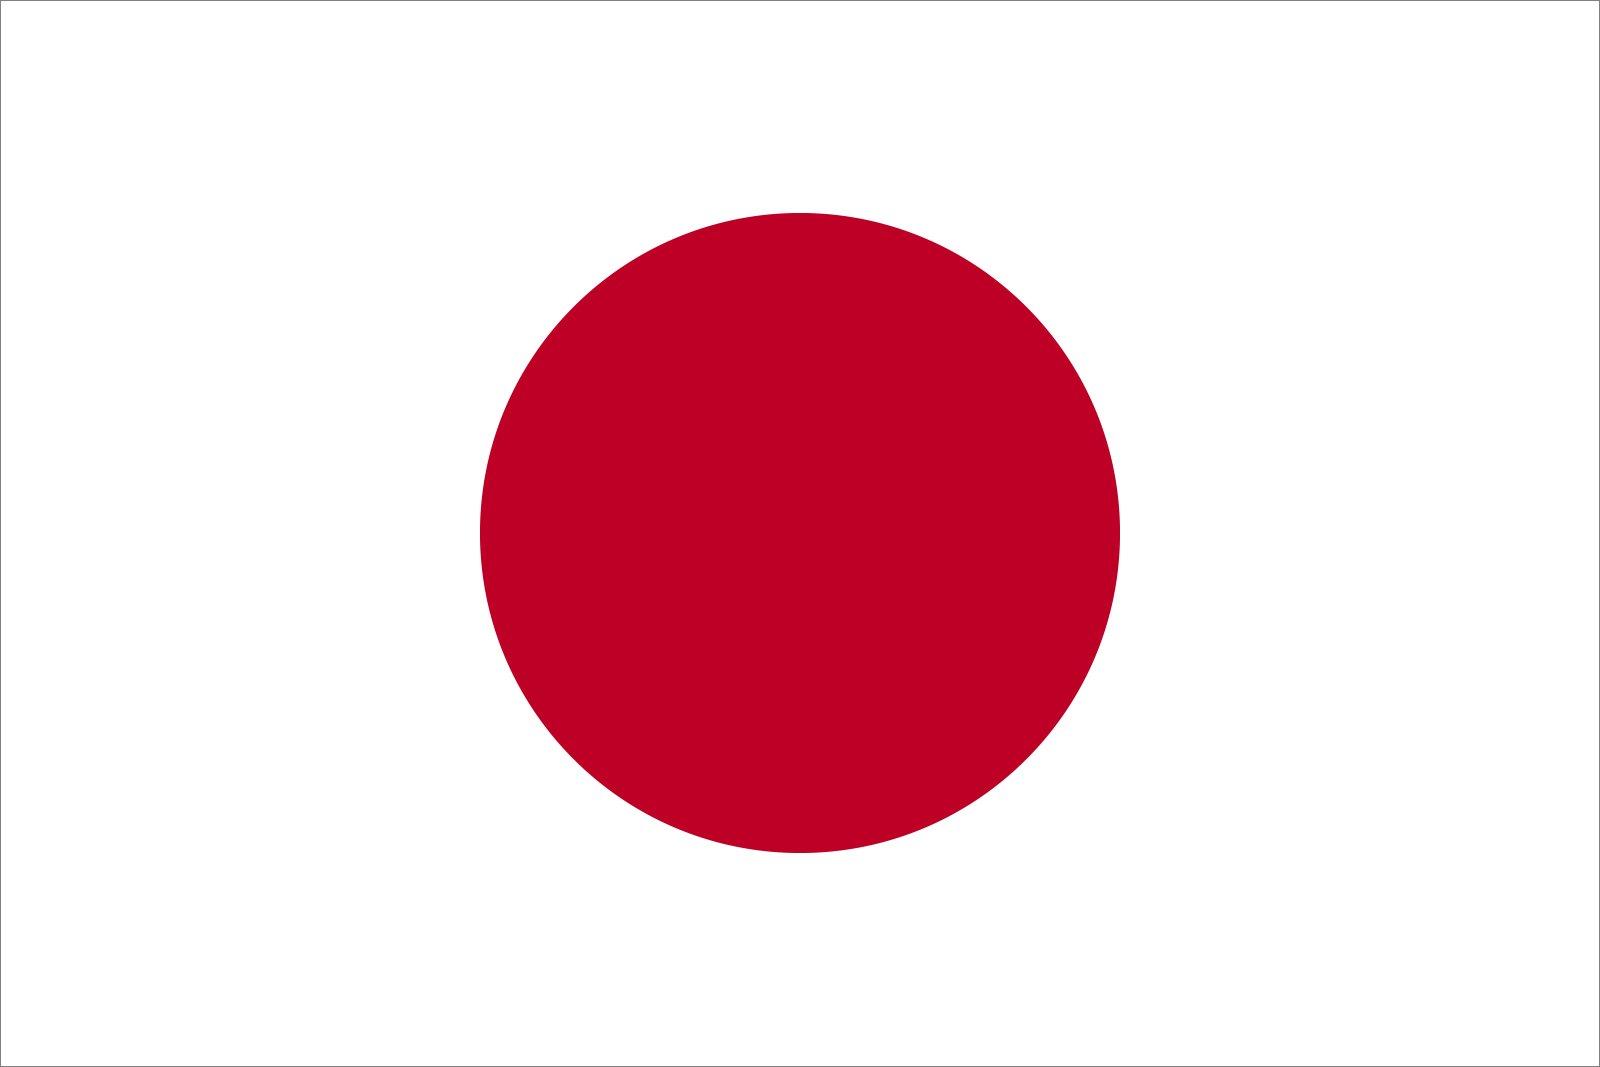 Travcour Visa & Legalisation Services Limited Japan Visa Application